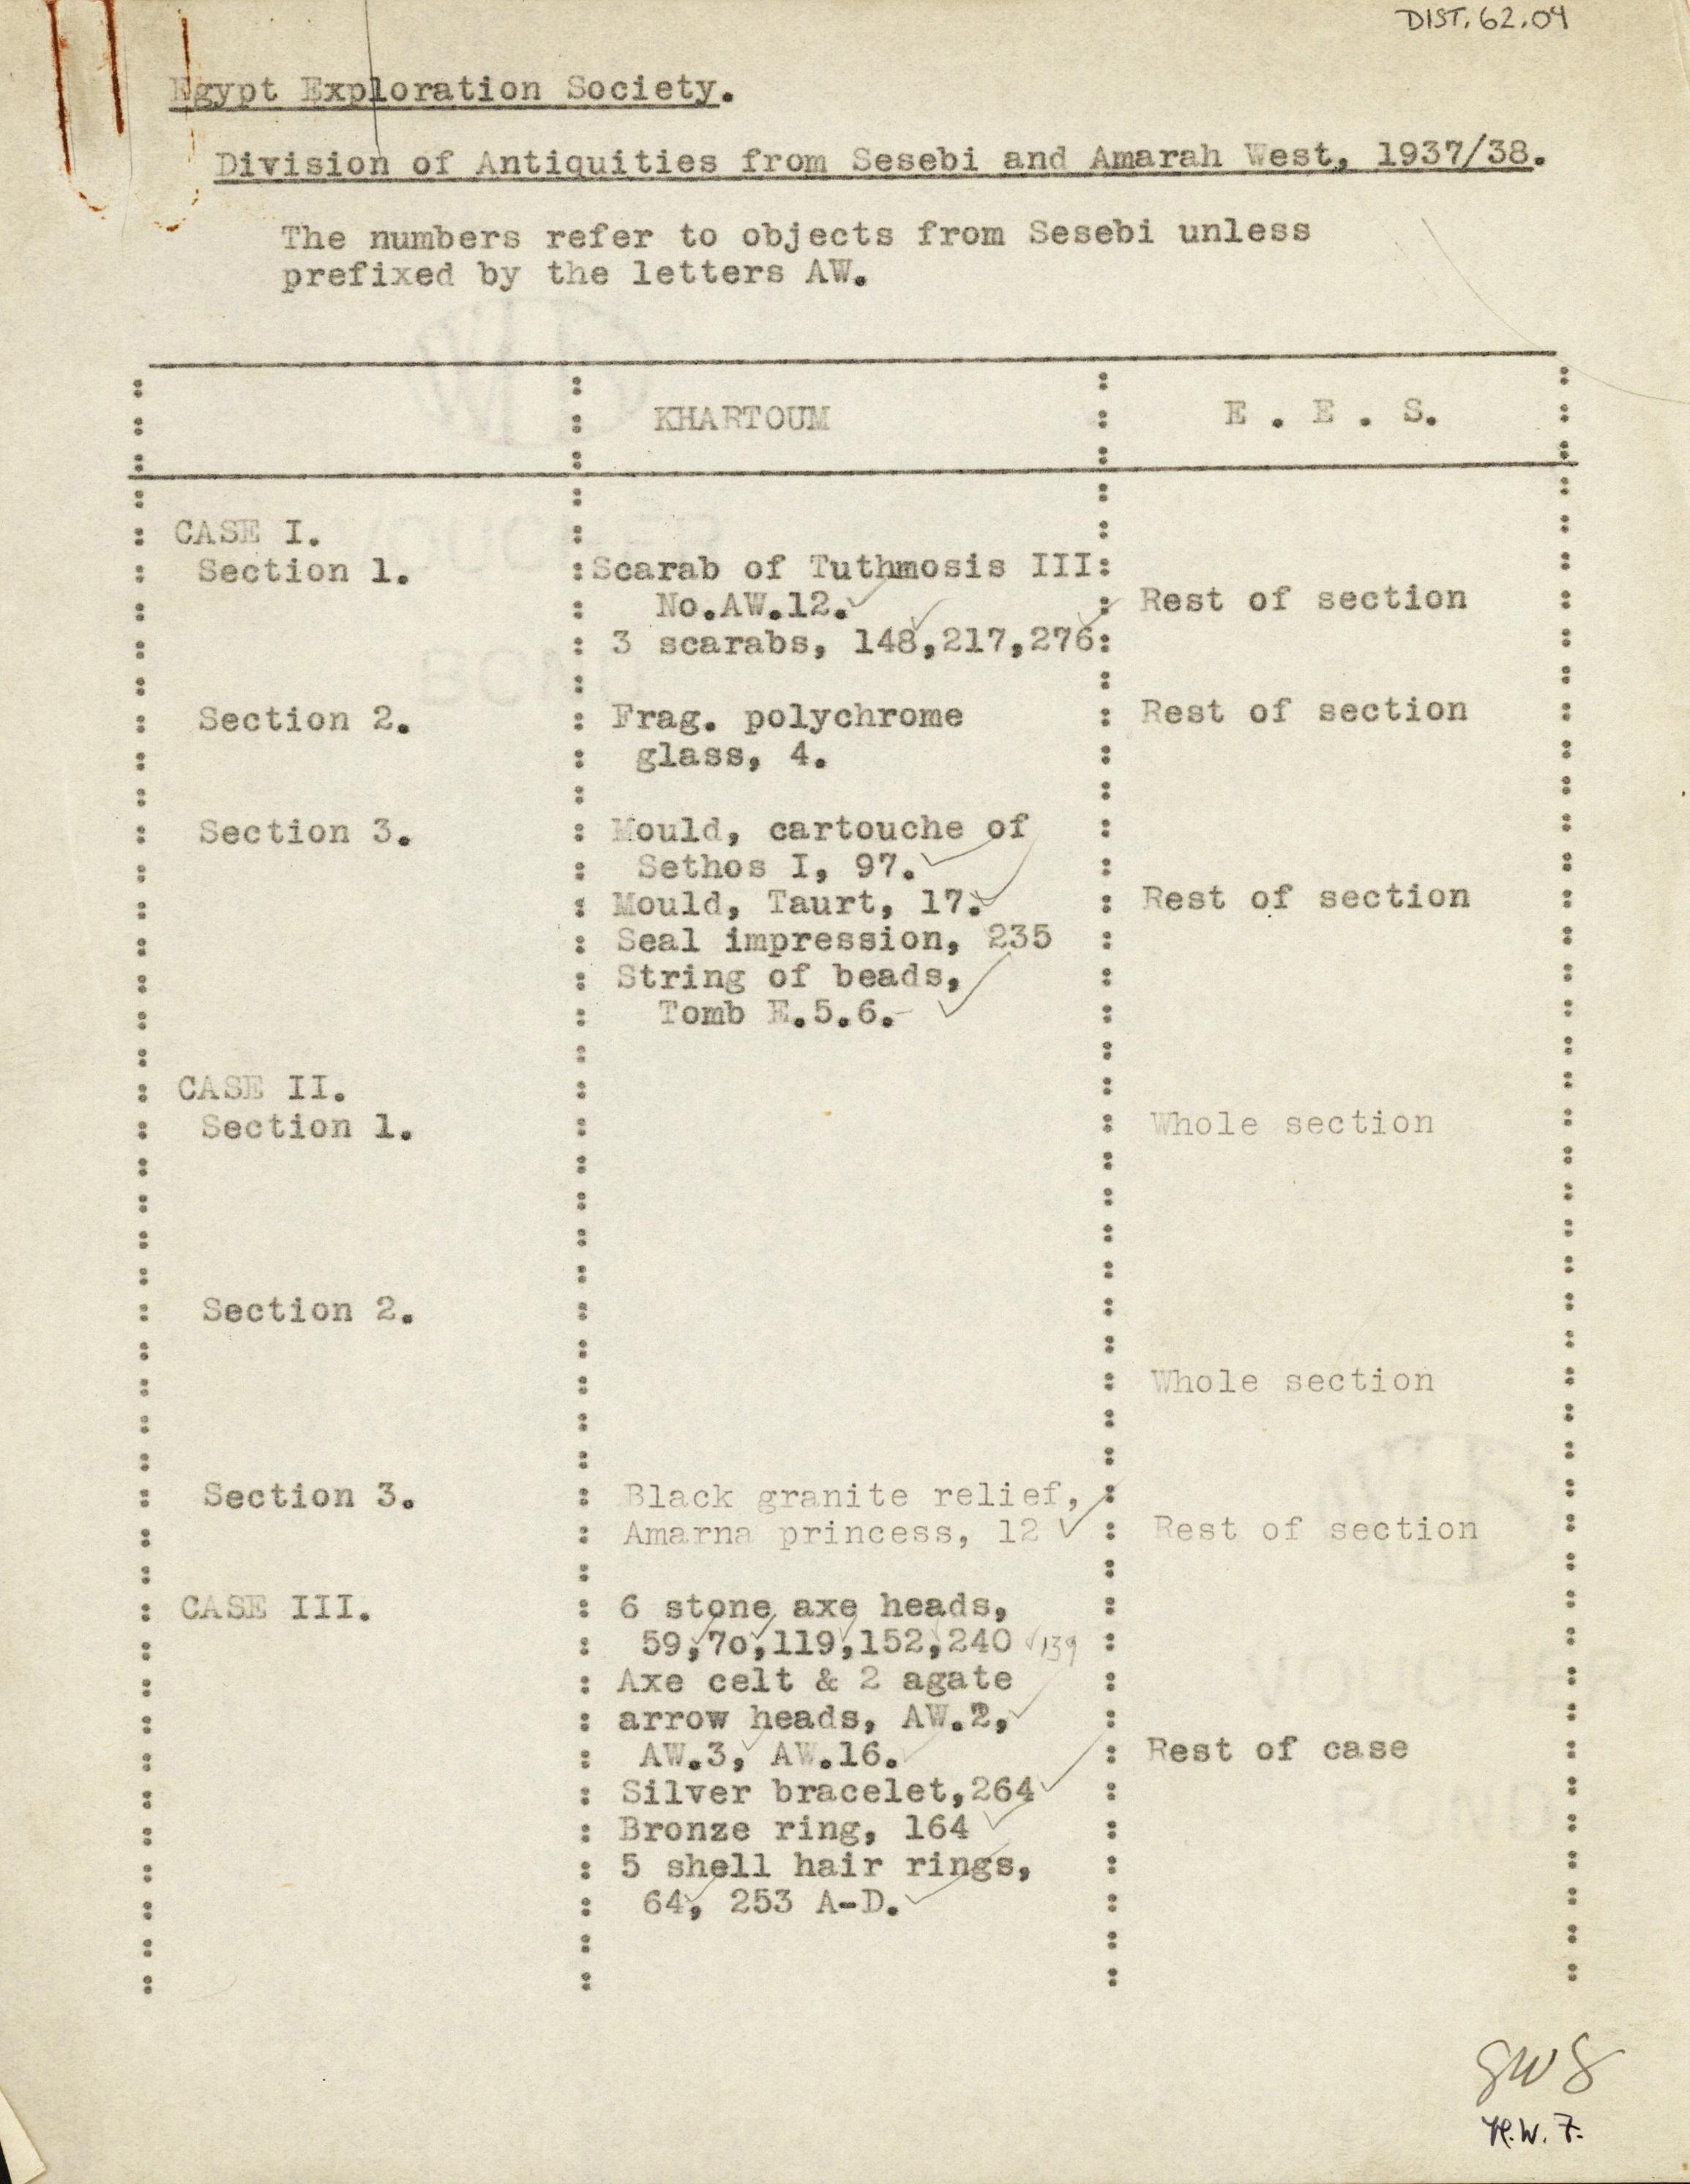 1936-38 Amarah West, Sesebi DIST.62.04a